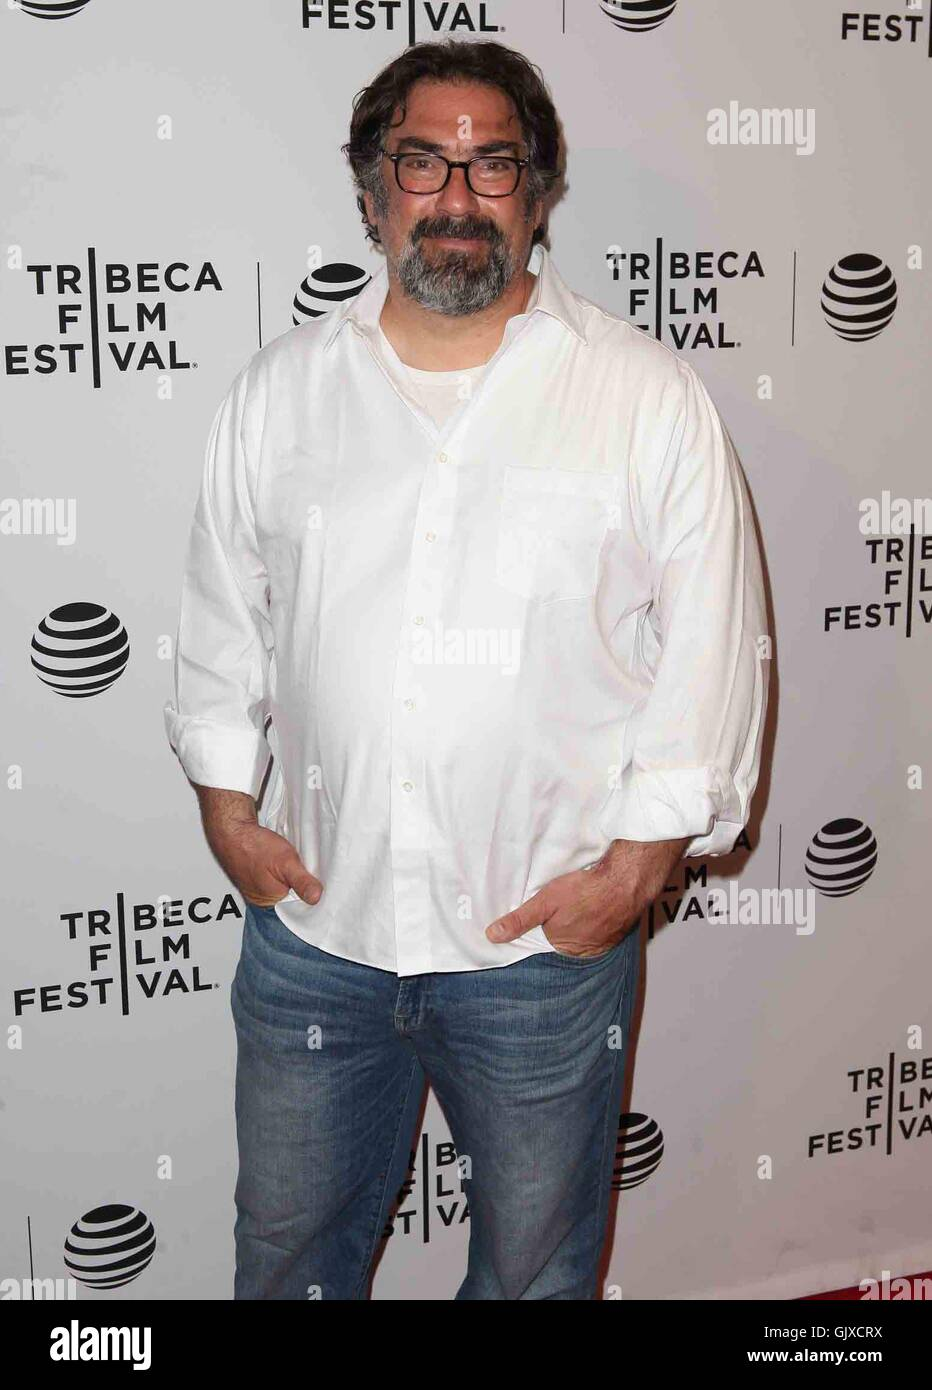 2016 Tribeca Film Festival - 'Untouchable' premiere at Bow Tie Chelsea Theatre - Arrivals  Featuring: Director, - Stock Image